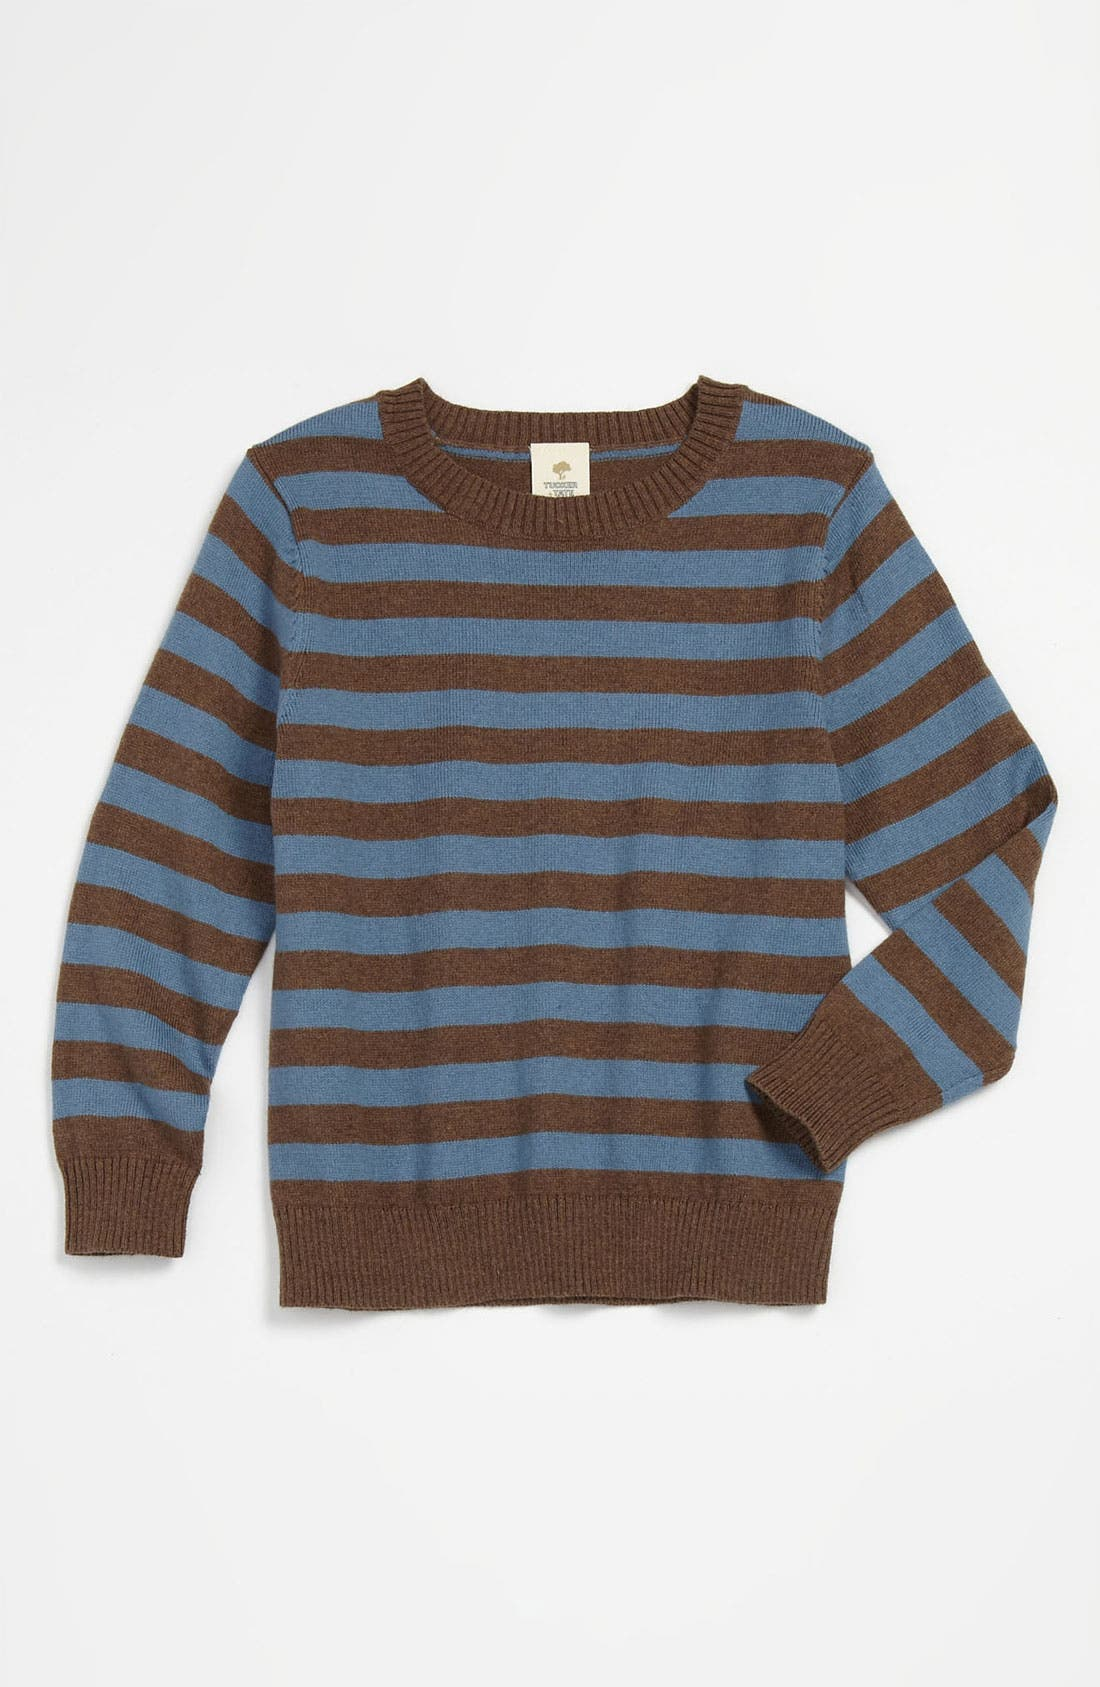 Alternate Image 1 Selected - Tucker + Tate 'James' Sweater (Toddler)